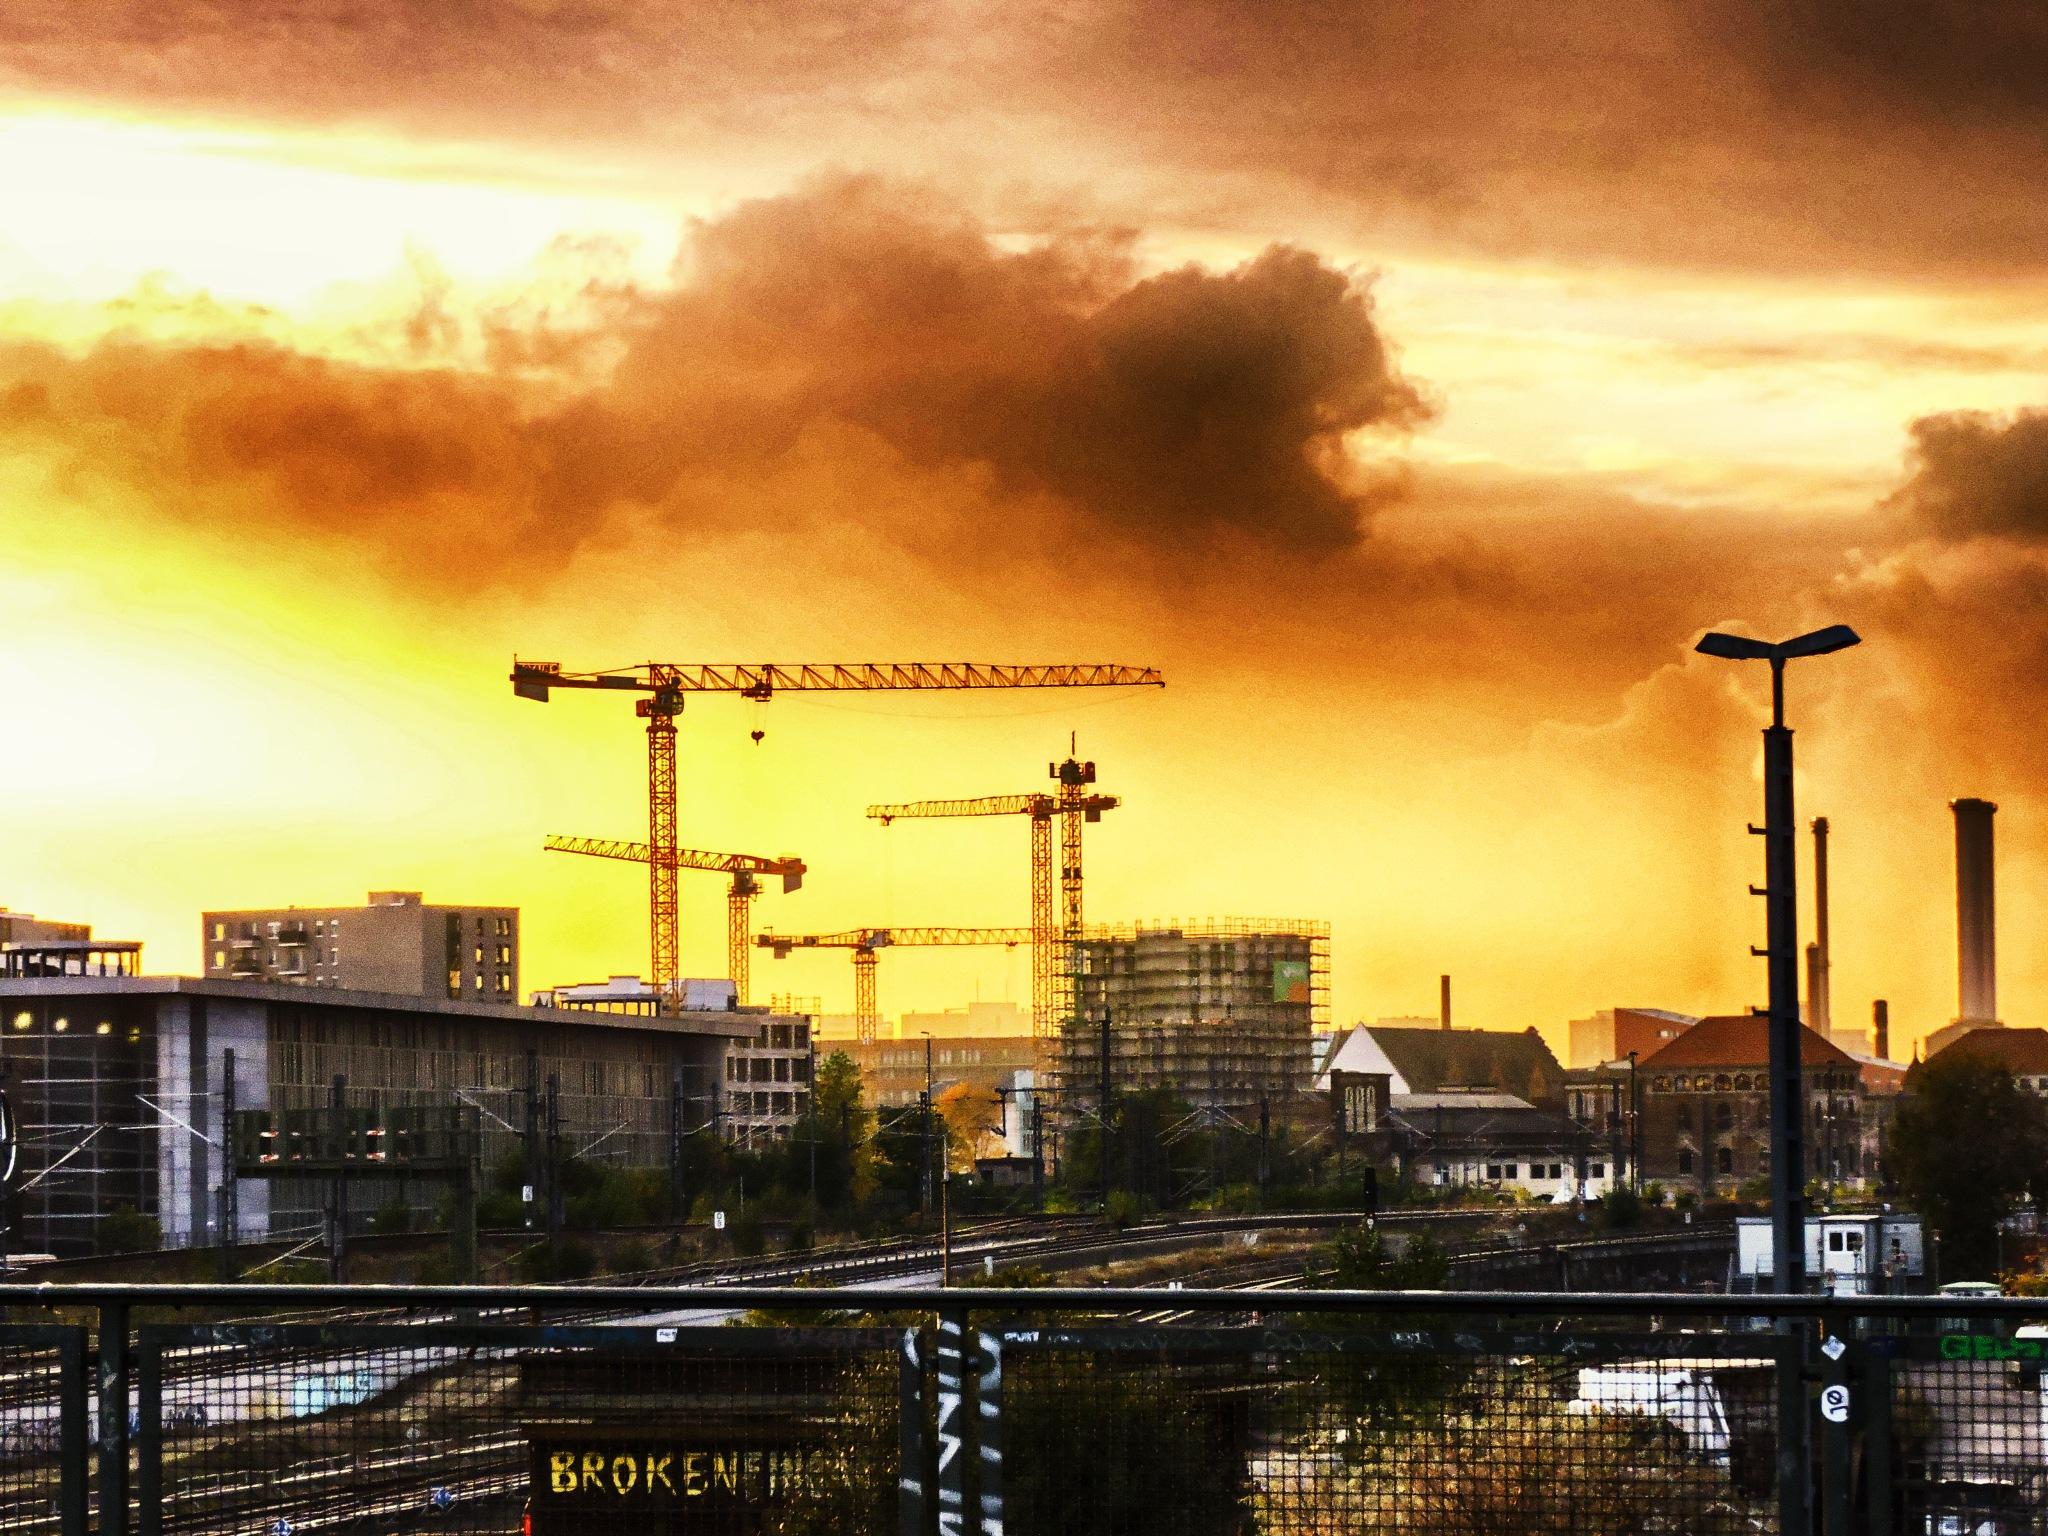 Berlin by FranklinB